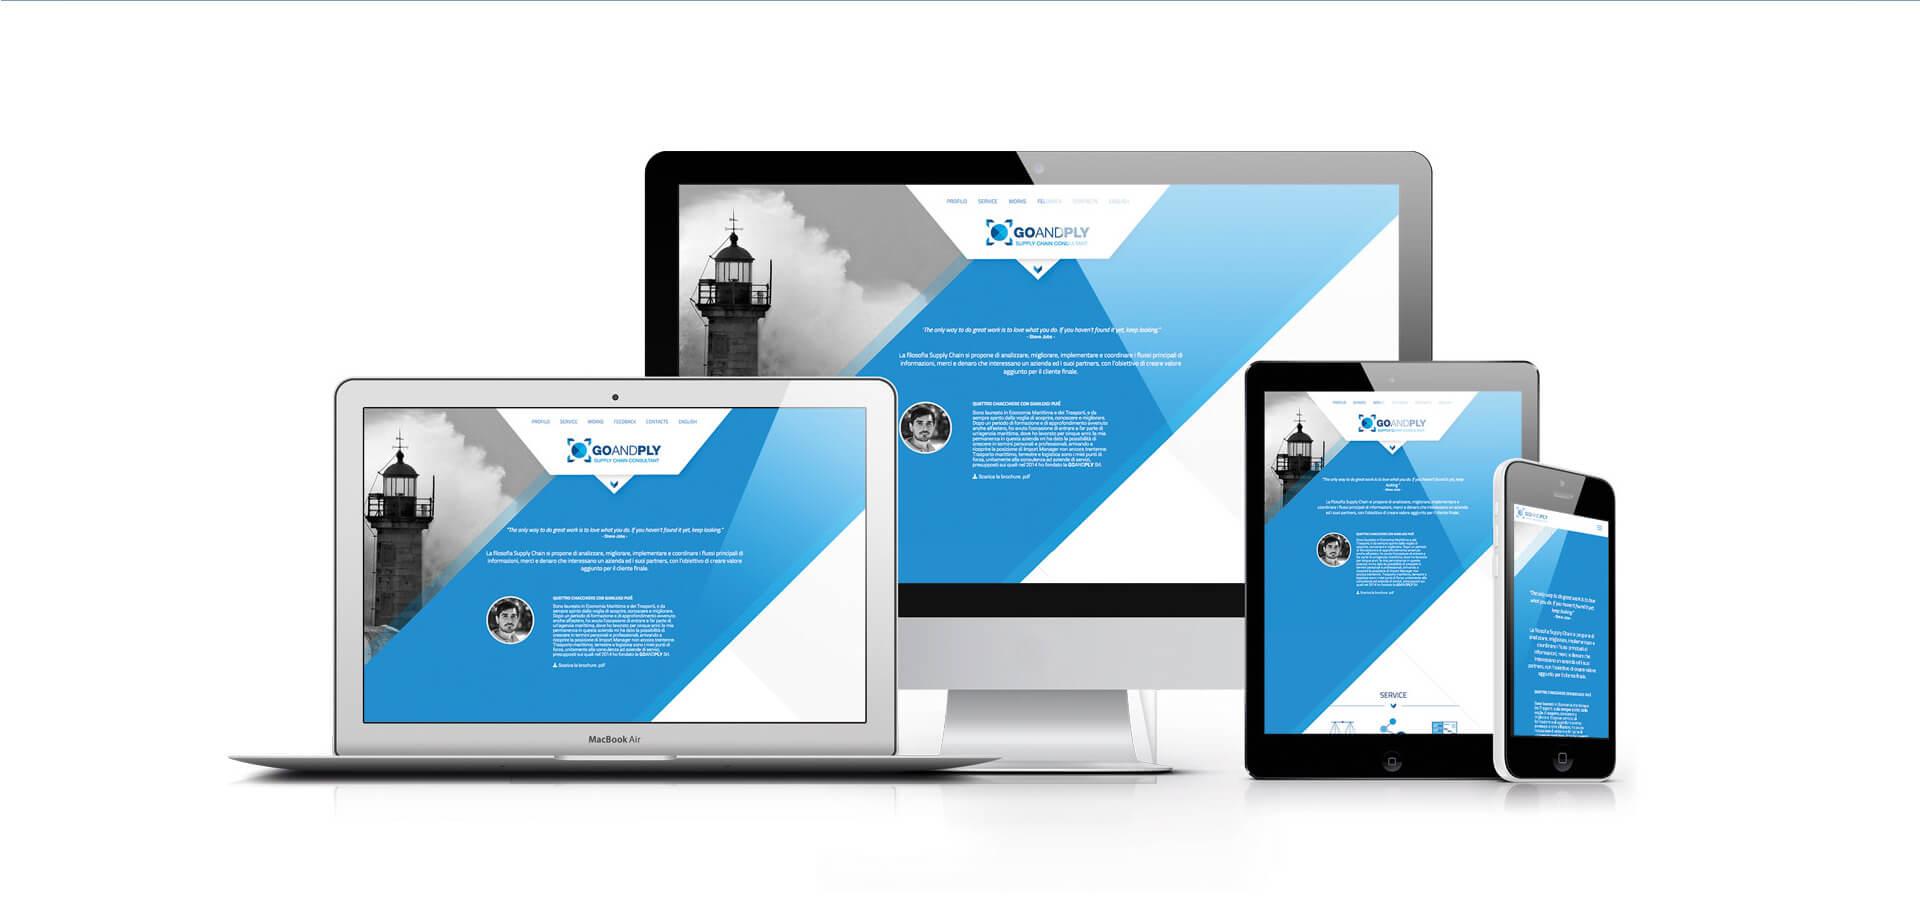 goandply-website-responsive